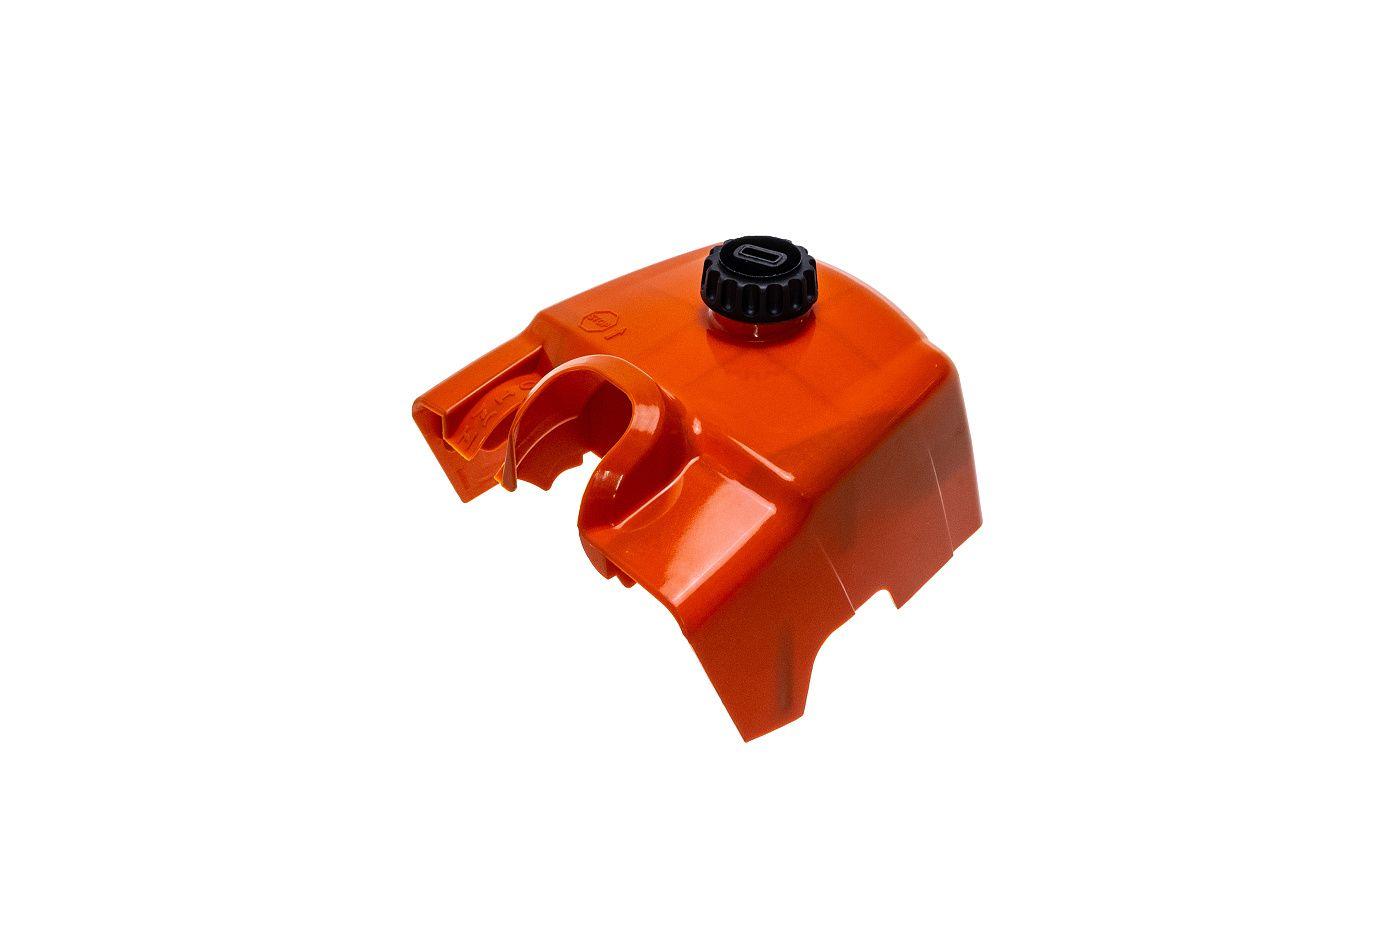 Kryt vzduchového filtra Stihl MS341 MS361 (1135 140 1901)